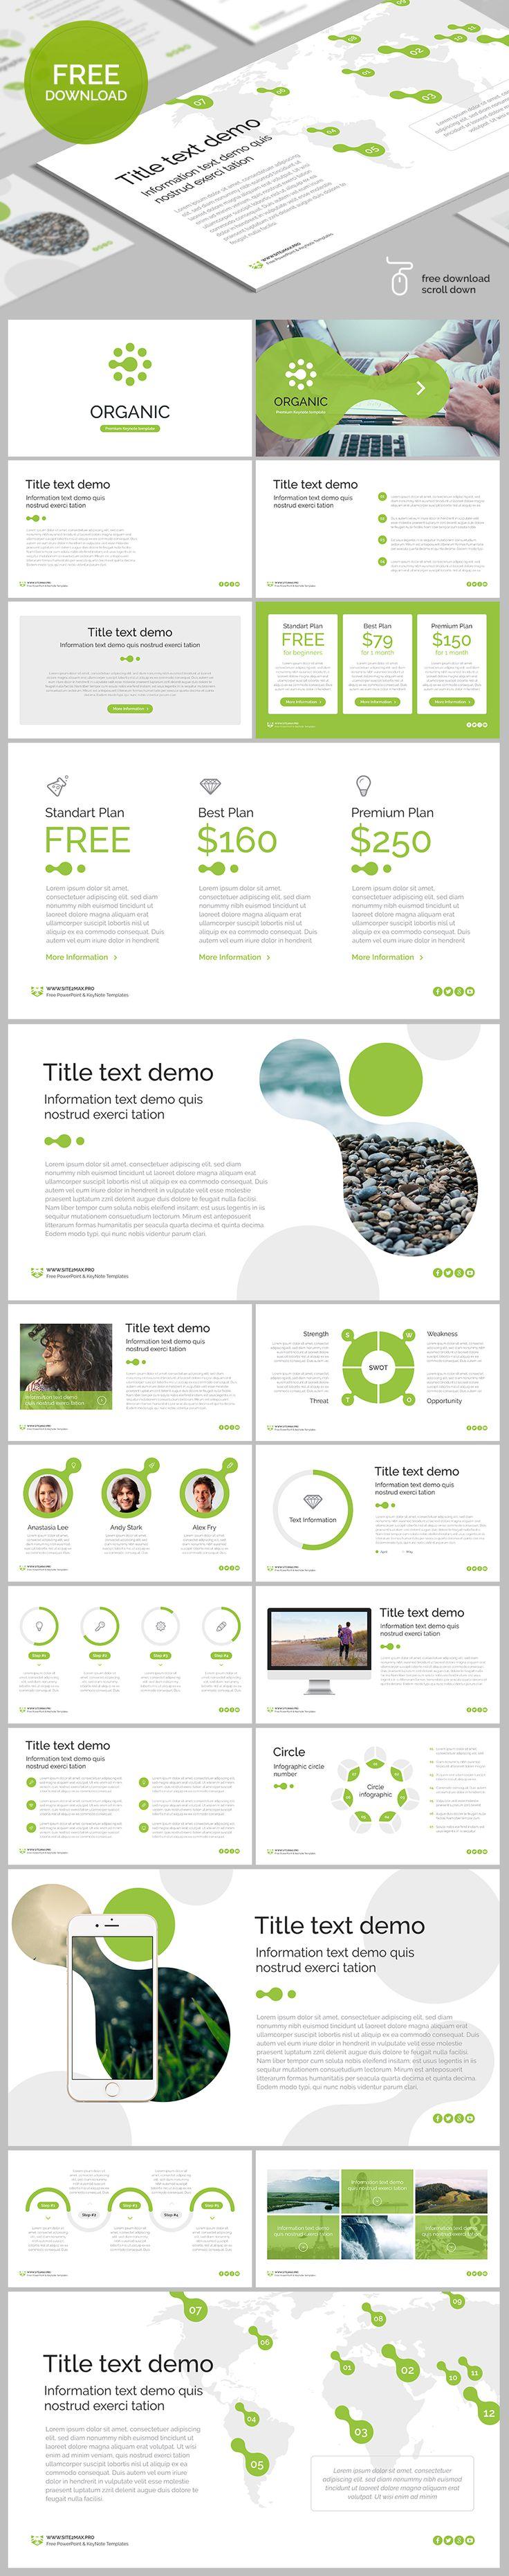 "DOWNLOAD LINK: Free Keynote template ""Organic"", 20 unique slides, 16:9 HD, .key format, free Google font. More Free PowerPoint and KeyNote template > #free #nature #organic #eco #keynote #freebies #key #design #green #download"